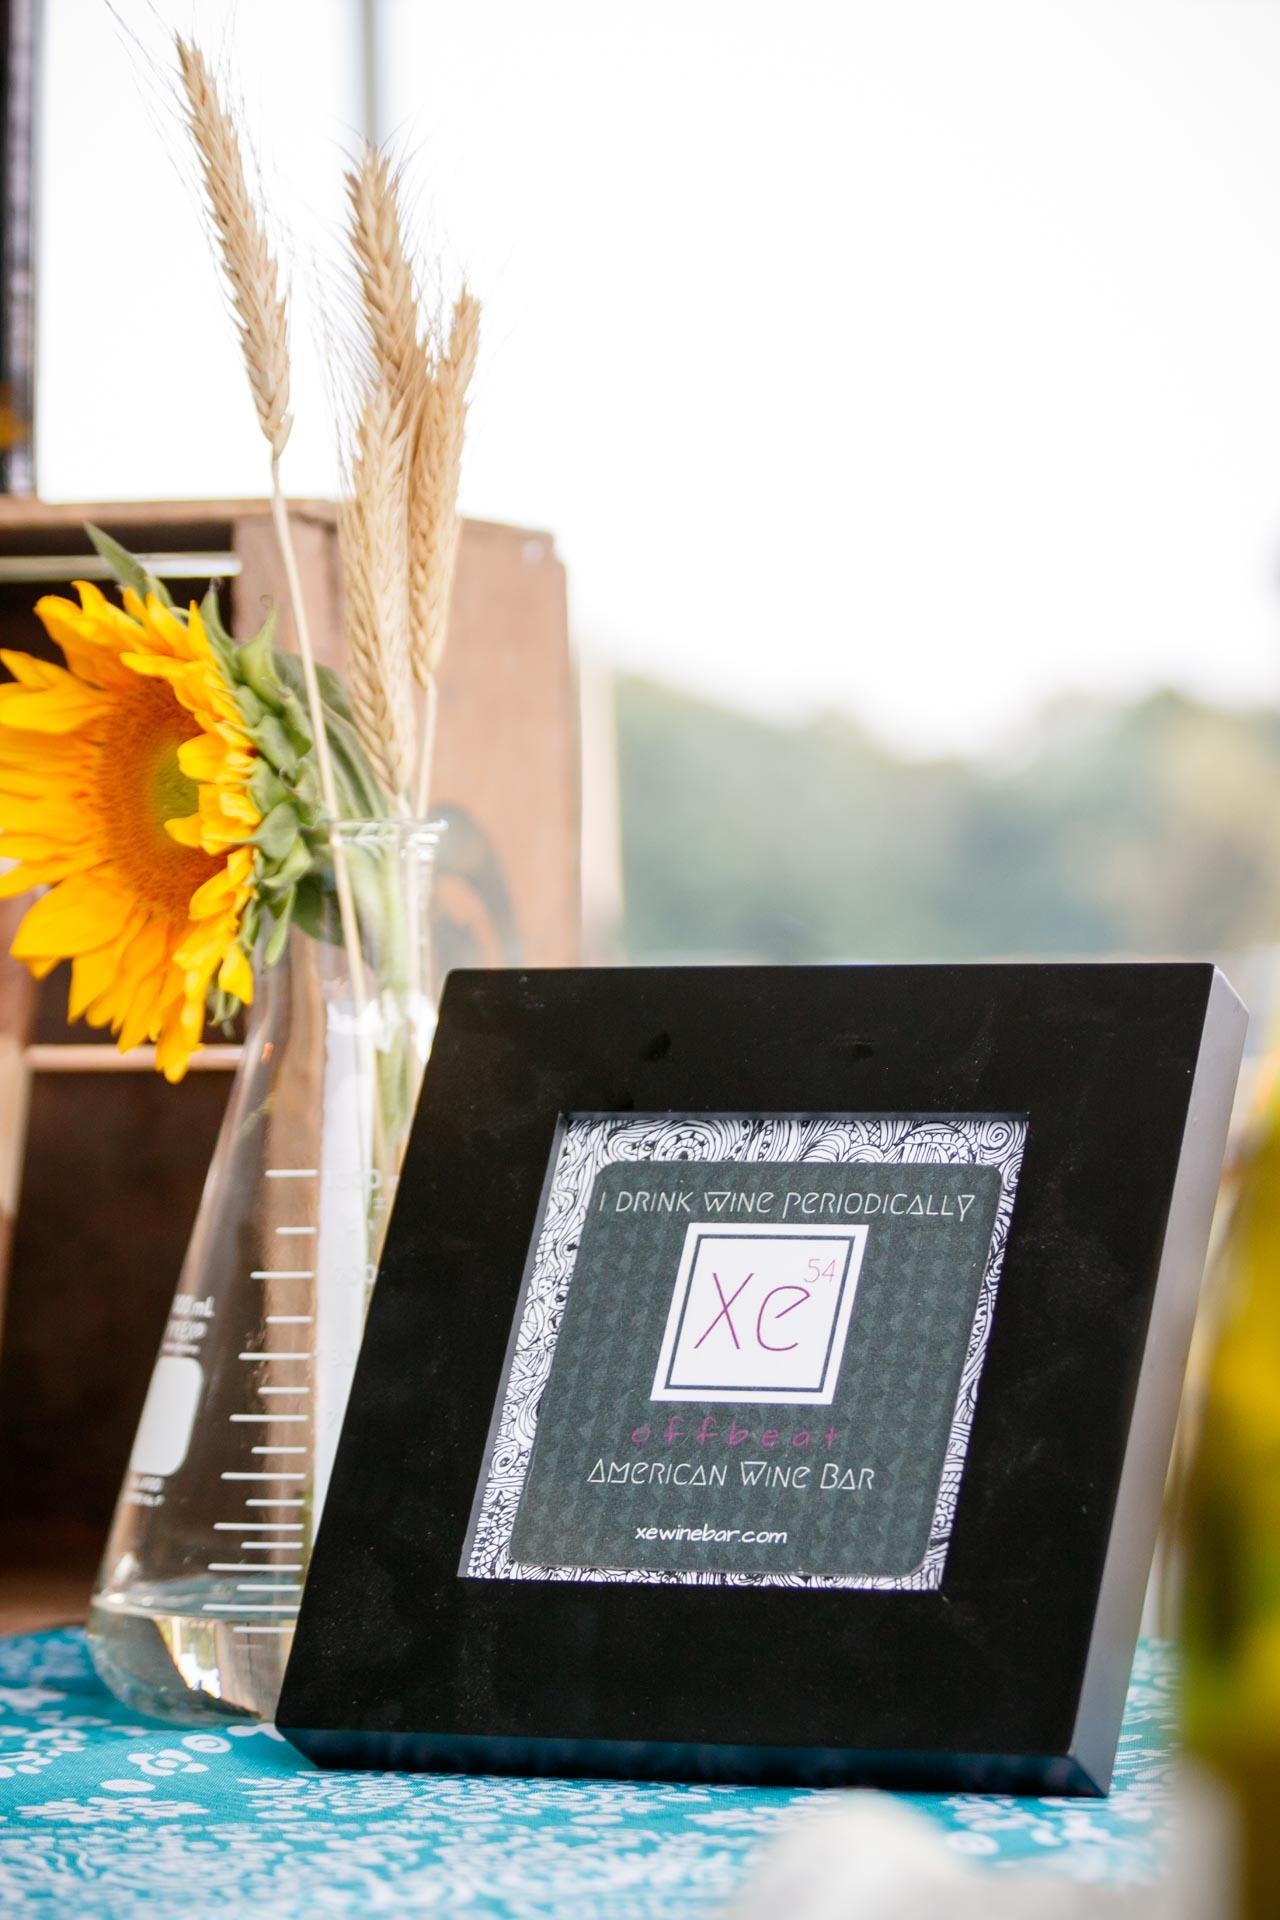 future-neenah-sunset-dinner-farm-to-table-adam-shea-photography-green-bay-appleton-neenah-photographer-22.jpg